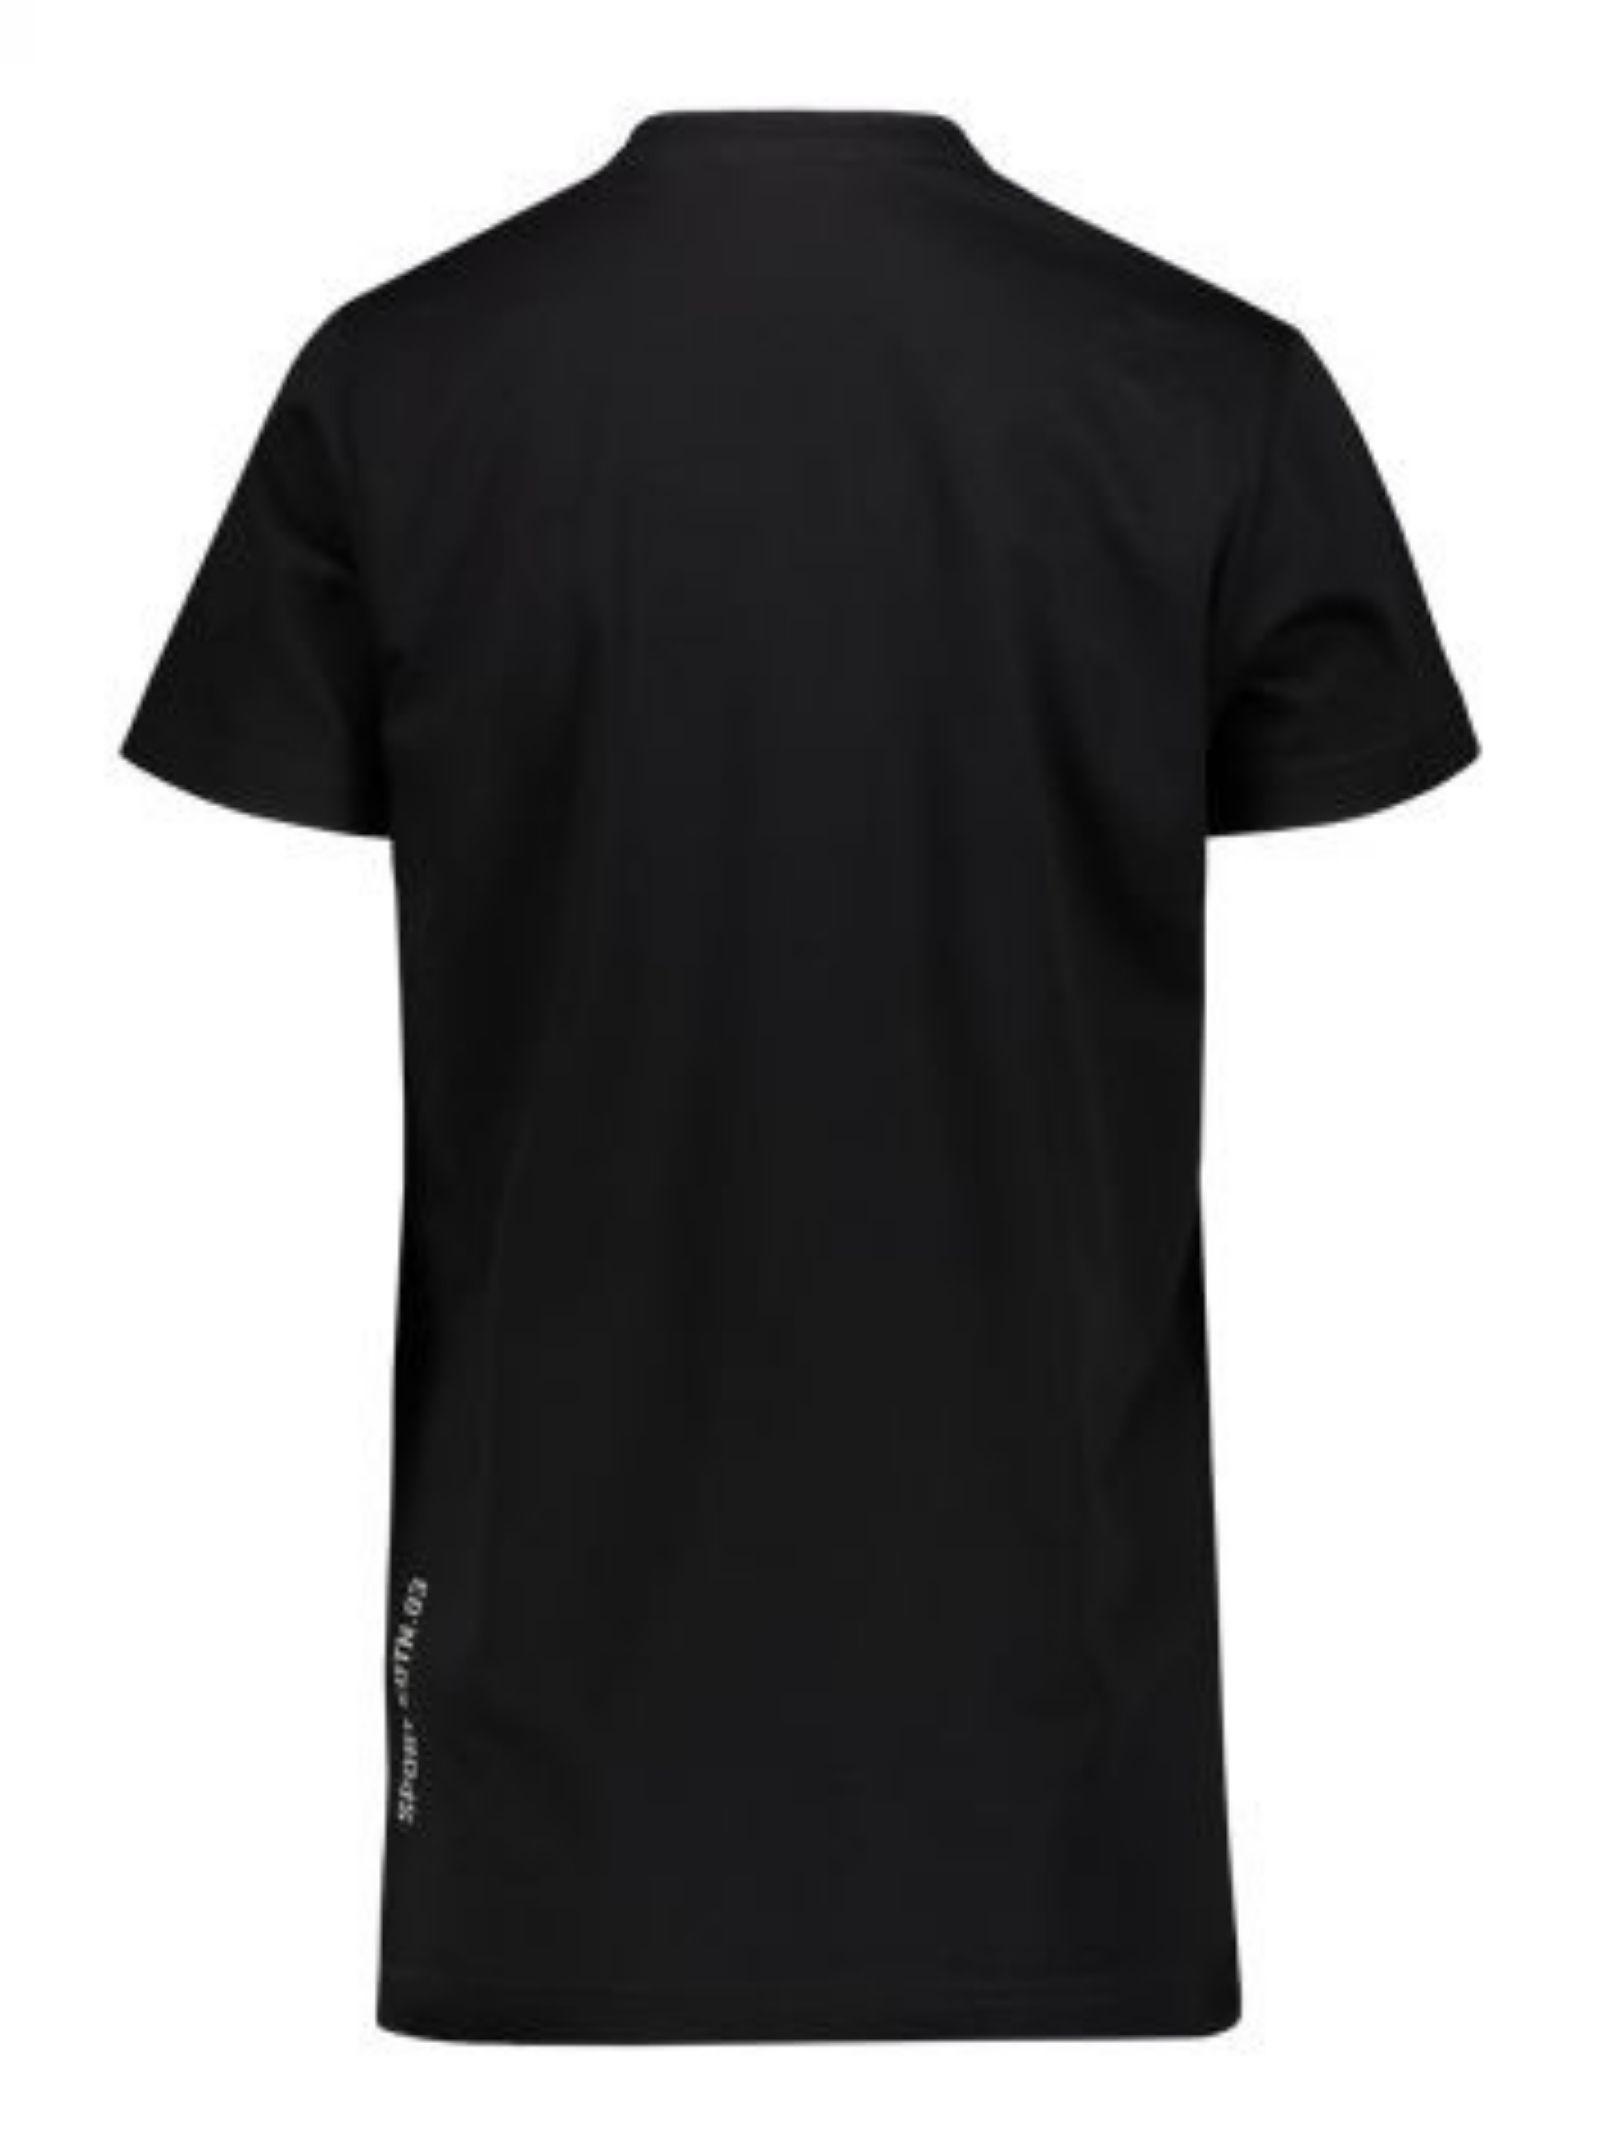 DSQUARED   T-shirt   DQ0028 D004GDQ900